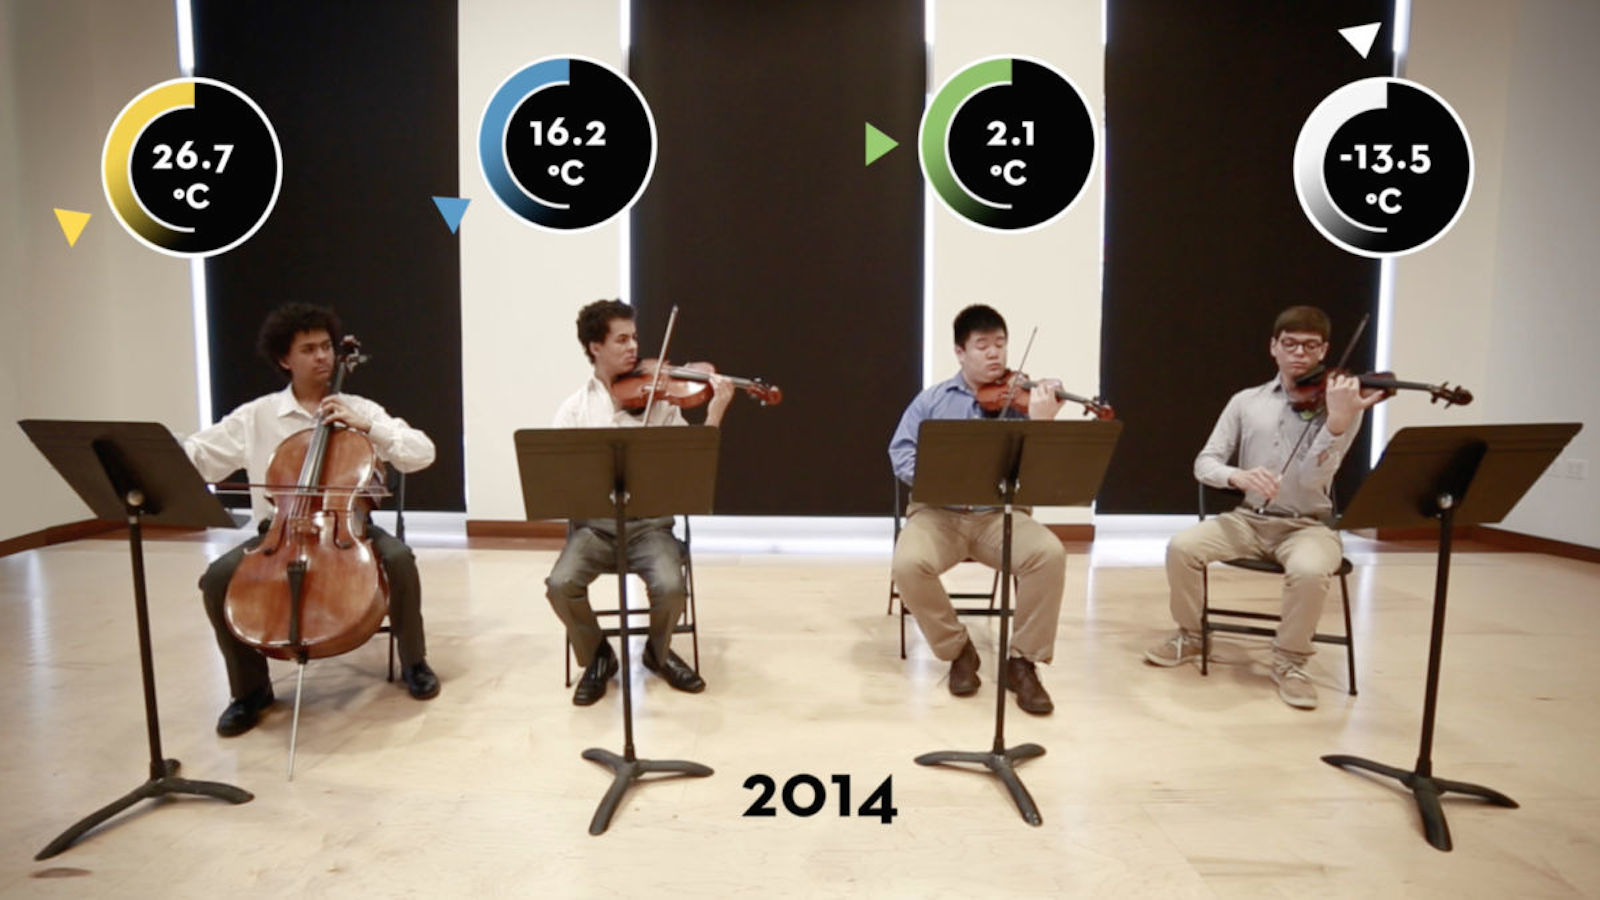 Quartet_and_gages_2014_j4gbgr